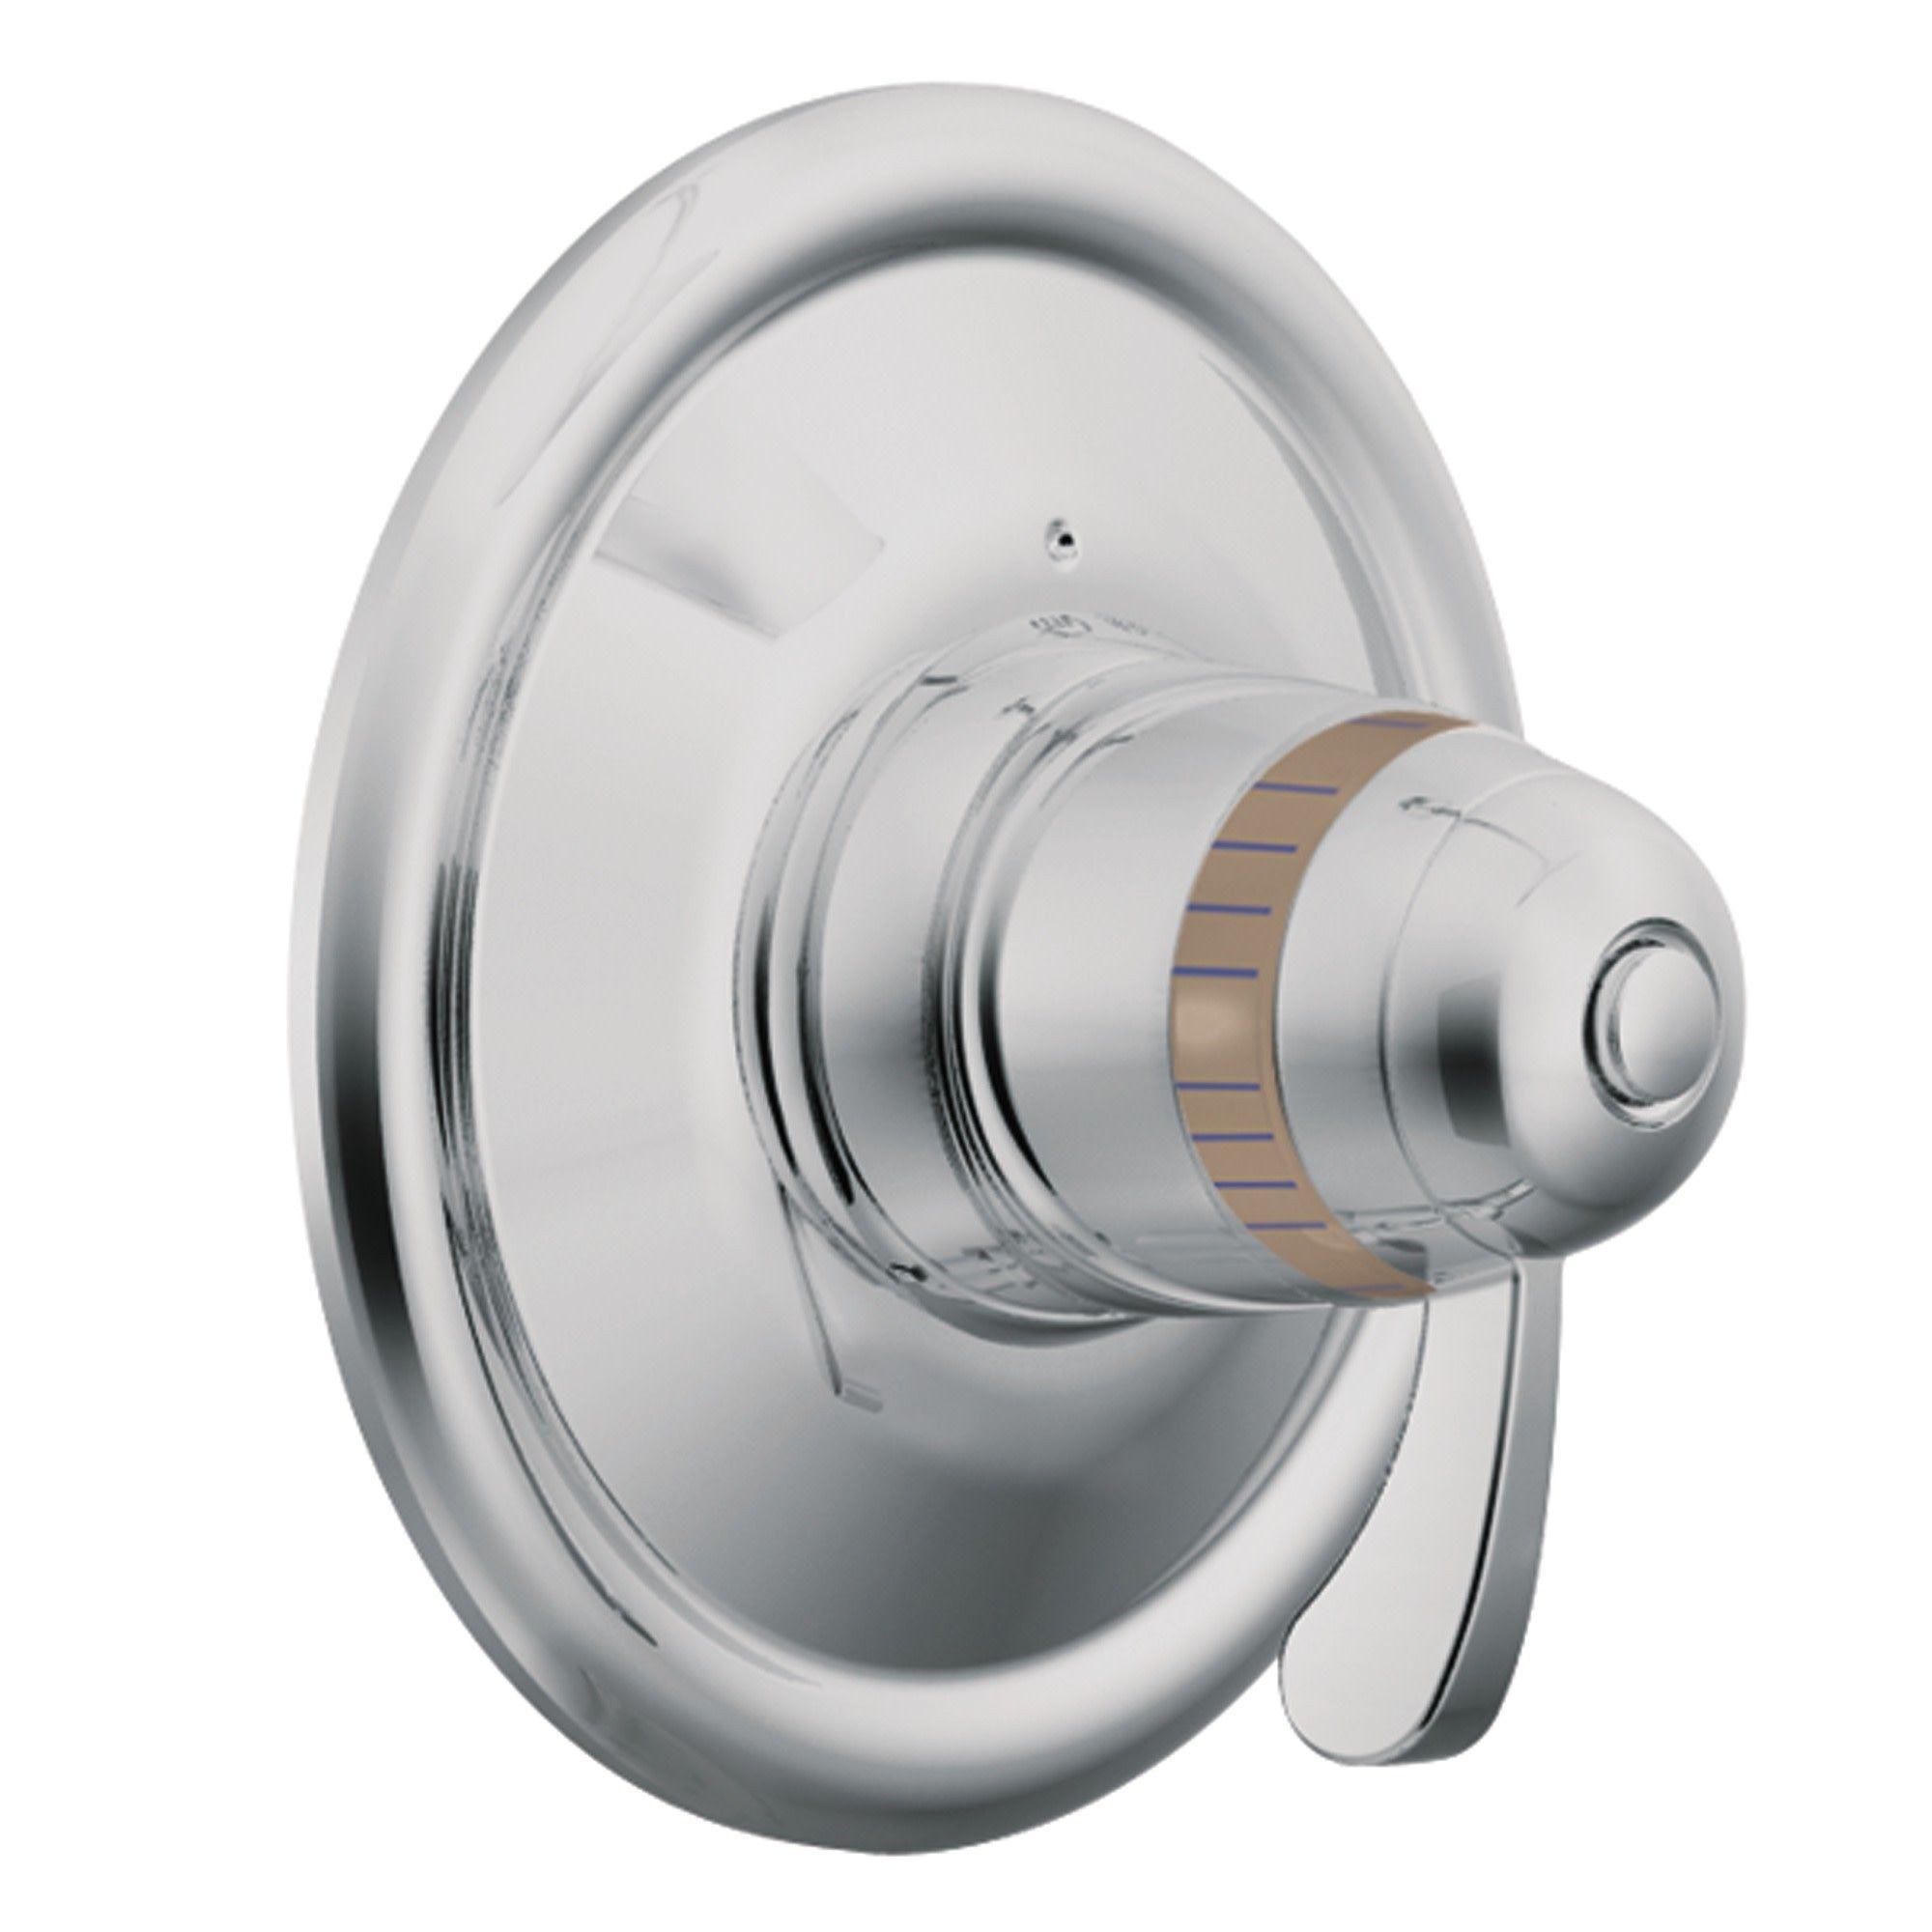 Moen Ts3411 Single Handle Exacttemp Thermostatic Valve Trim Only